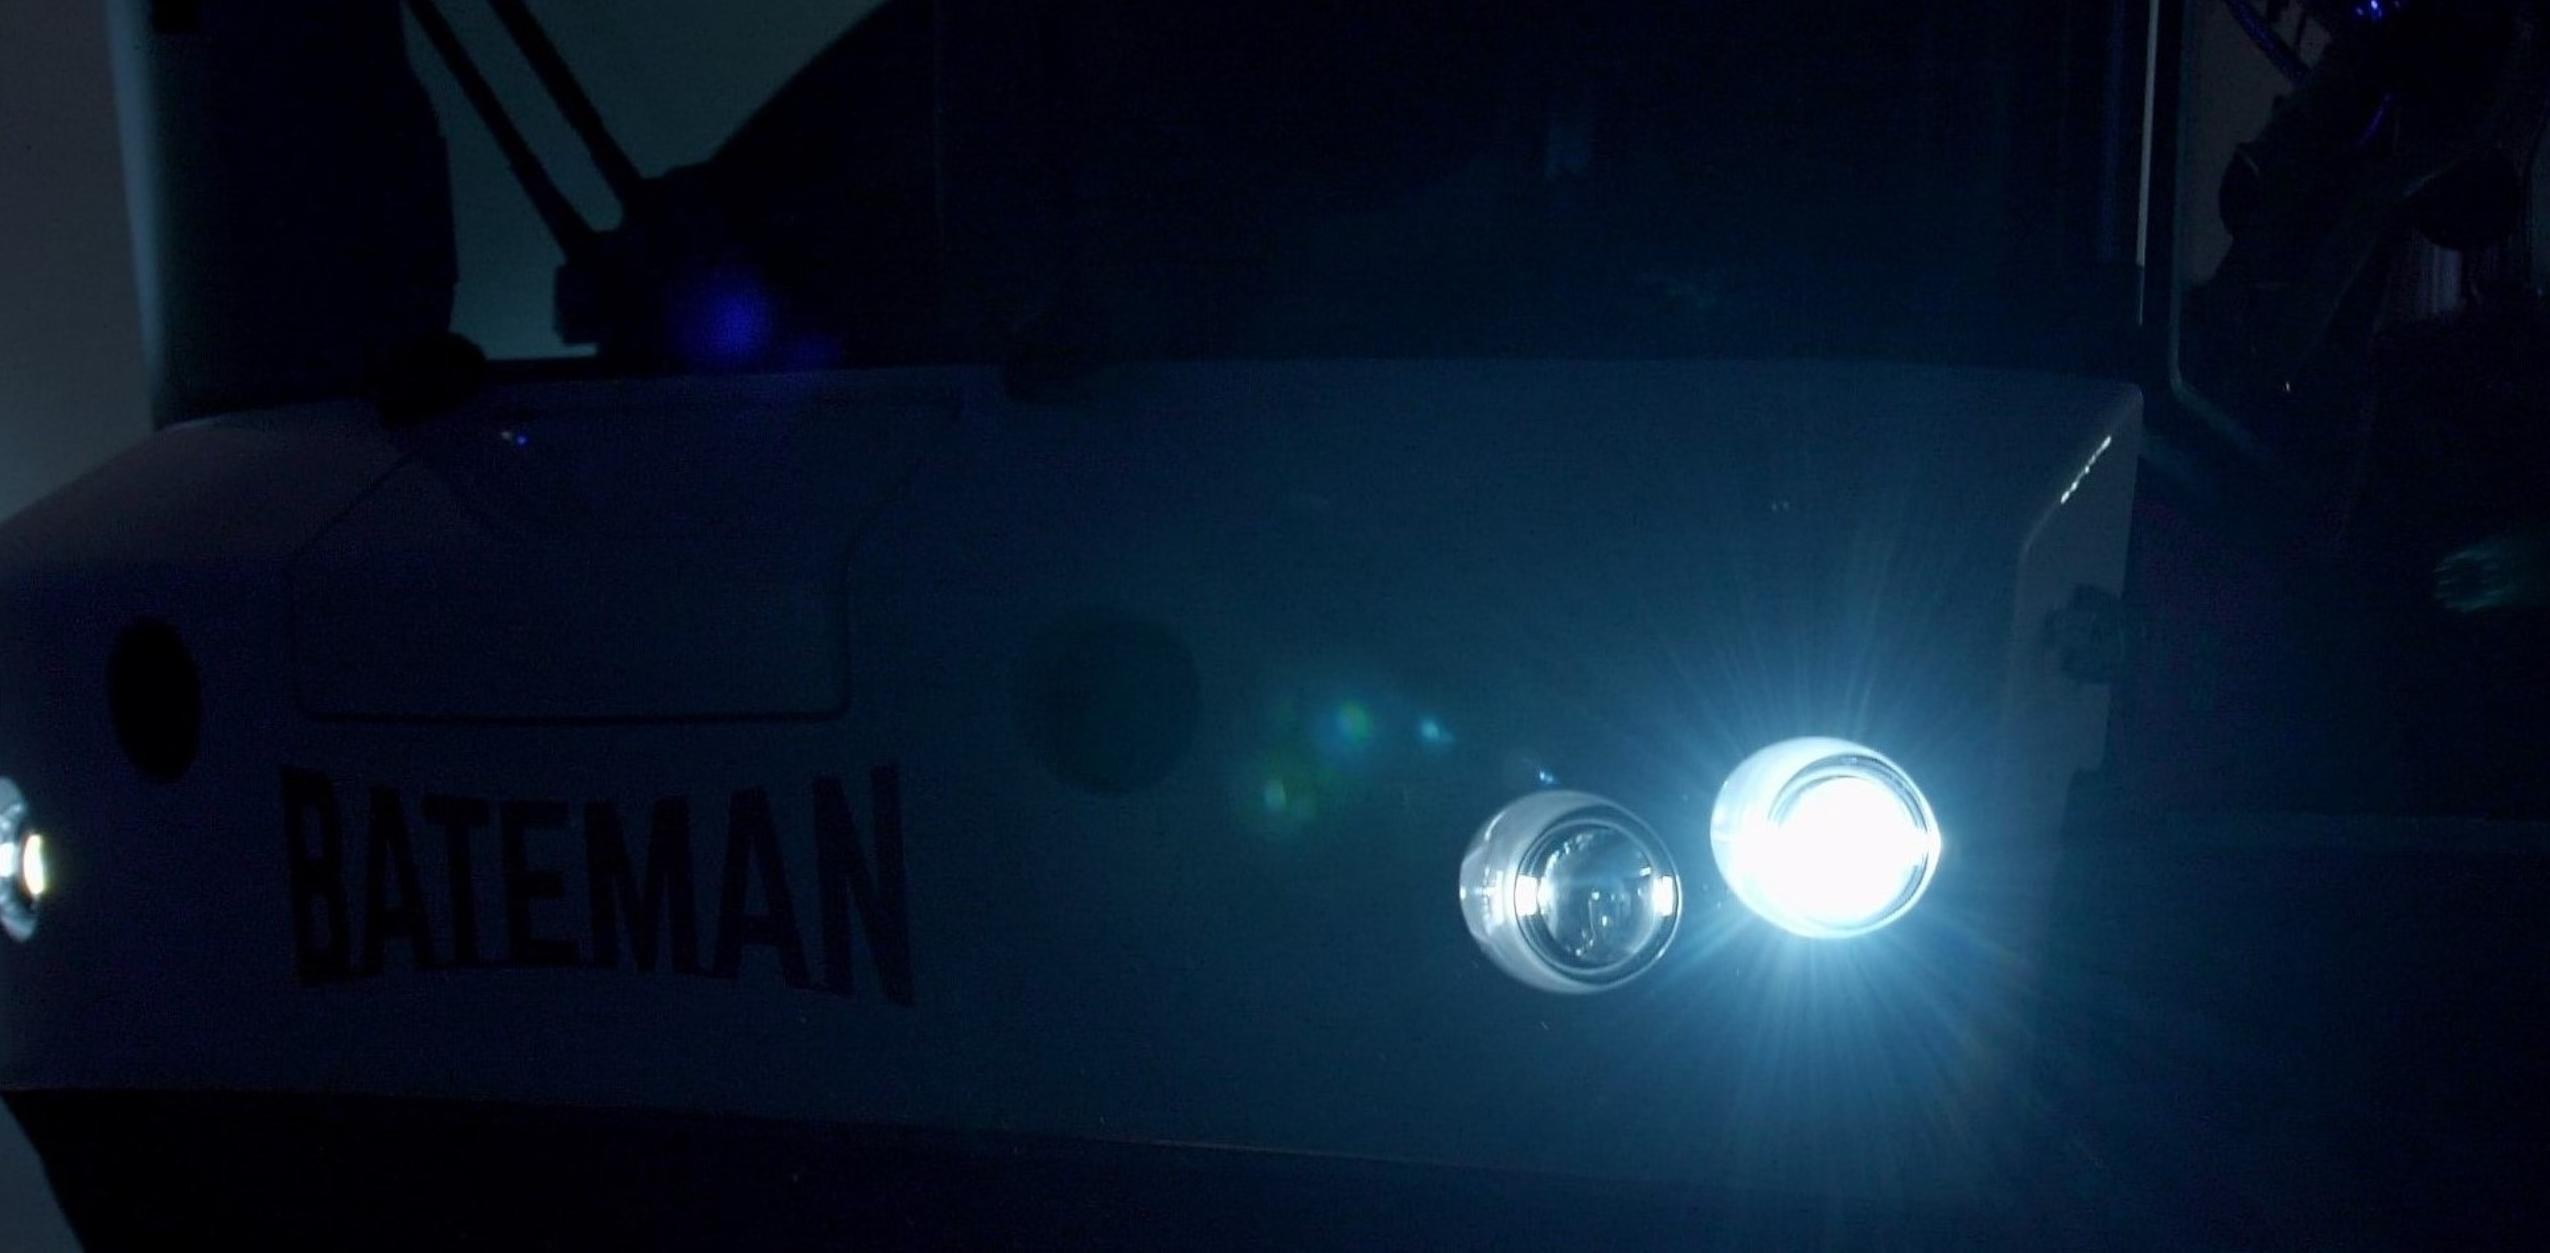 Bateman with venta lighting product